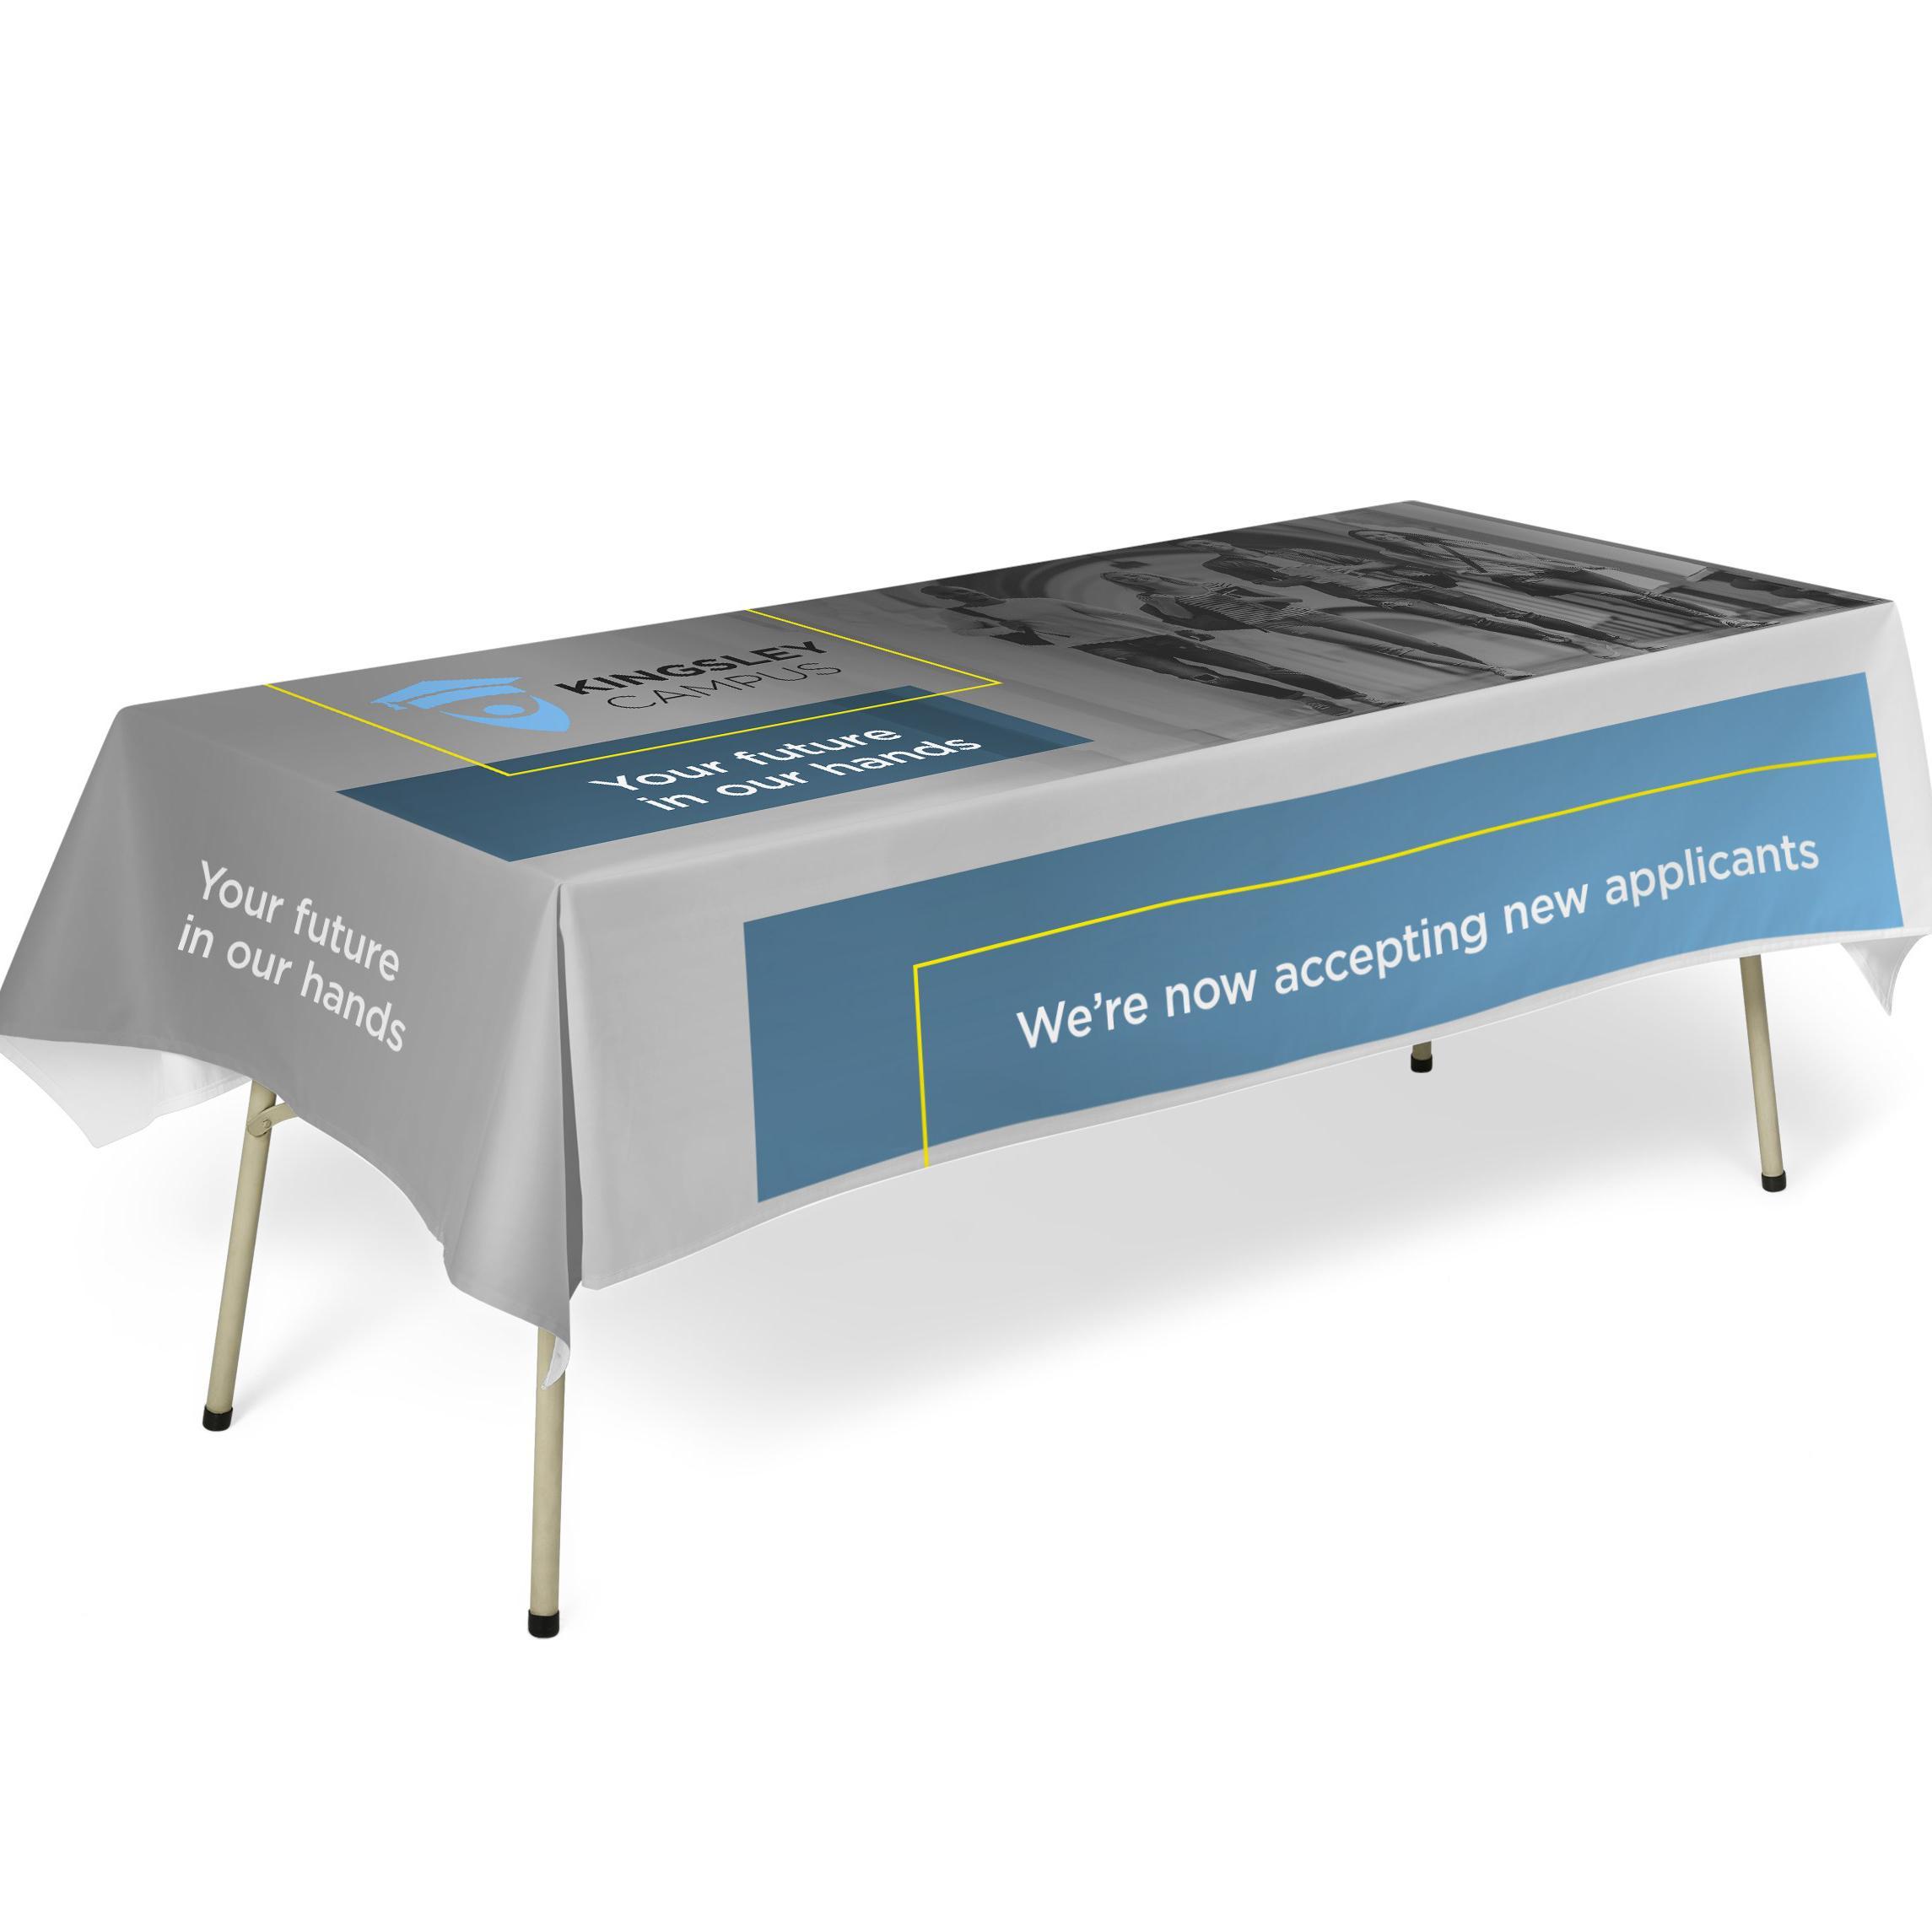 Legend Fabric Tablecloth 2.5m X 1.5m